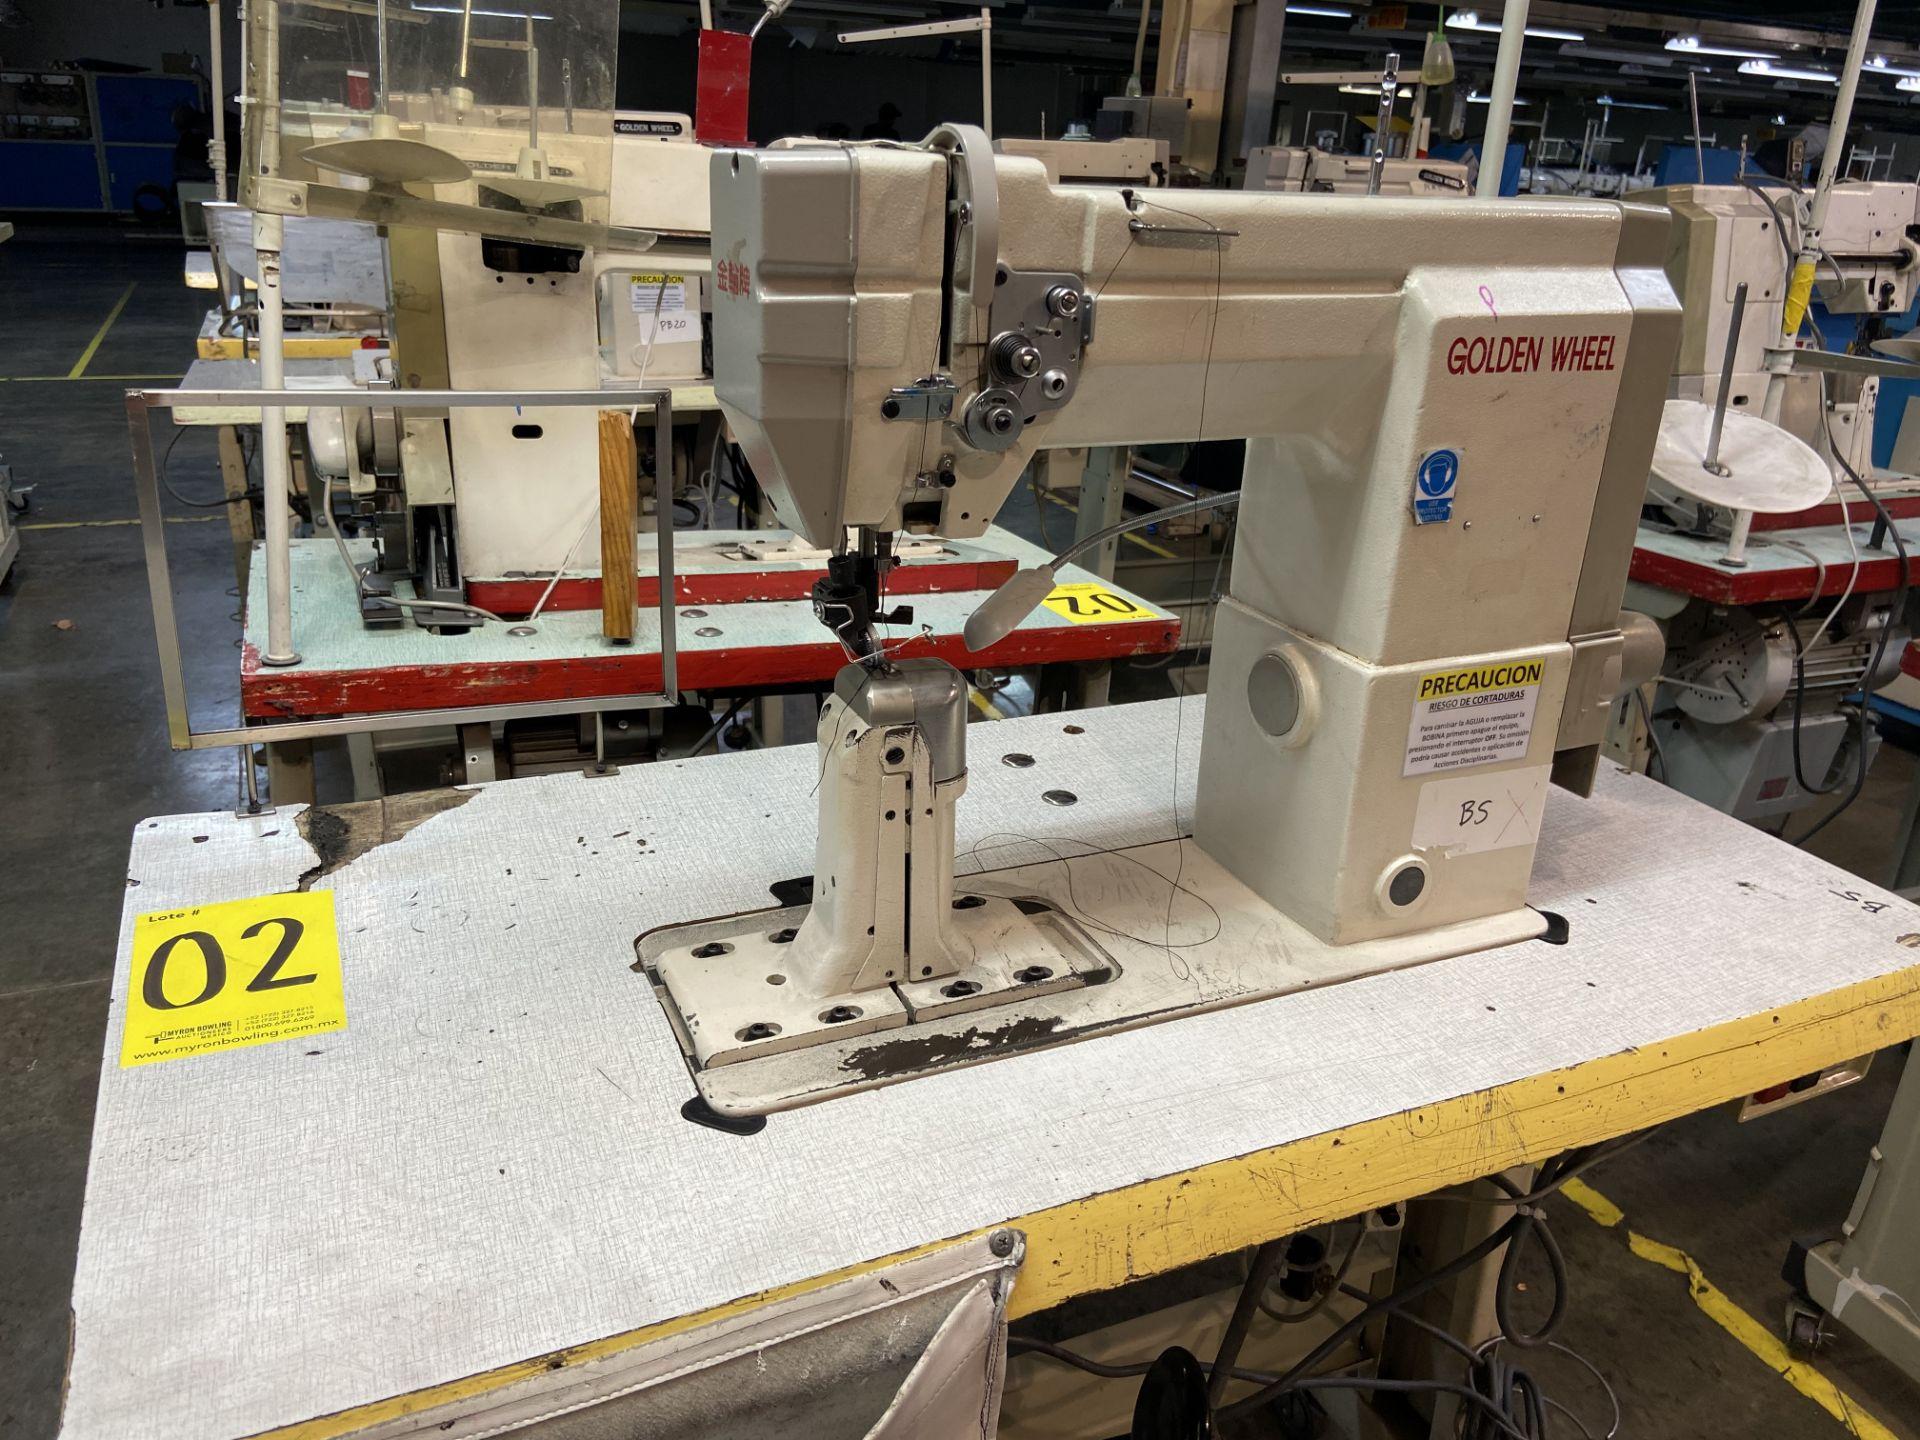 Lot 2 - (2) Máquinas de costura marca Golden Wheel de una aguja.